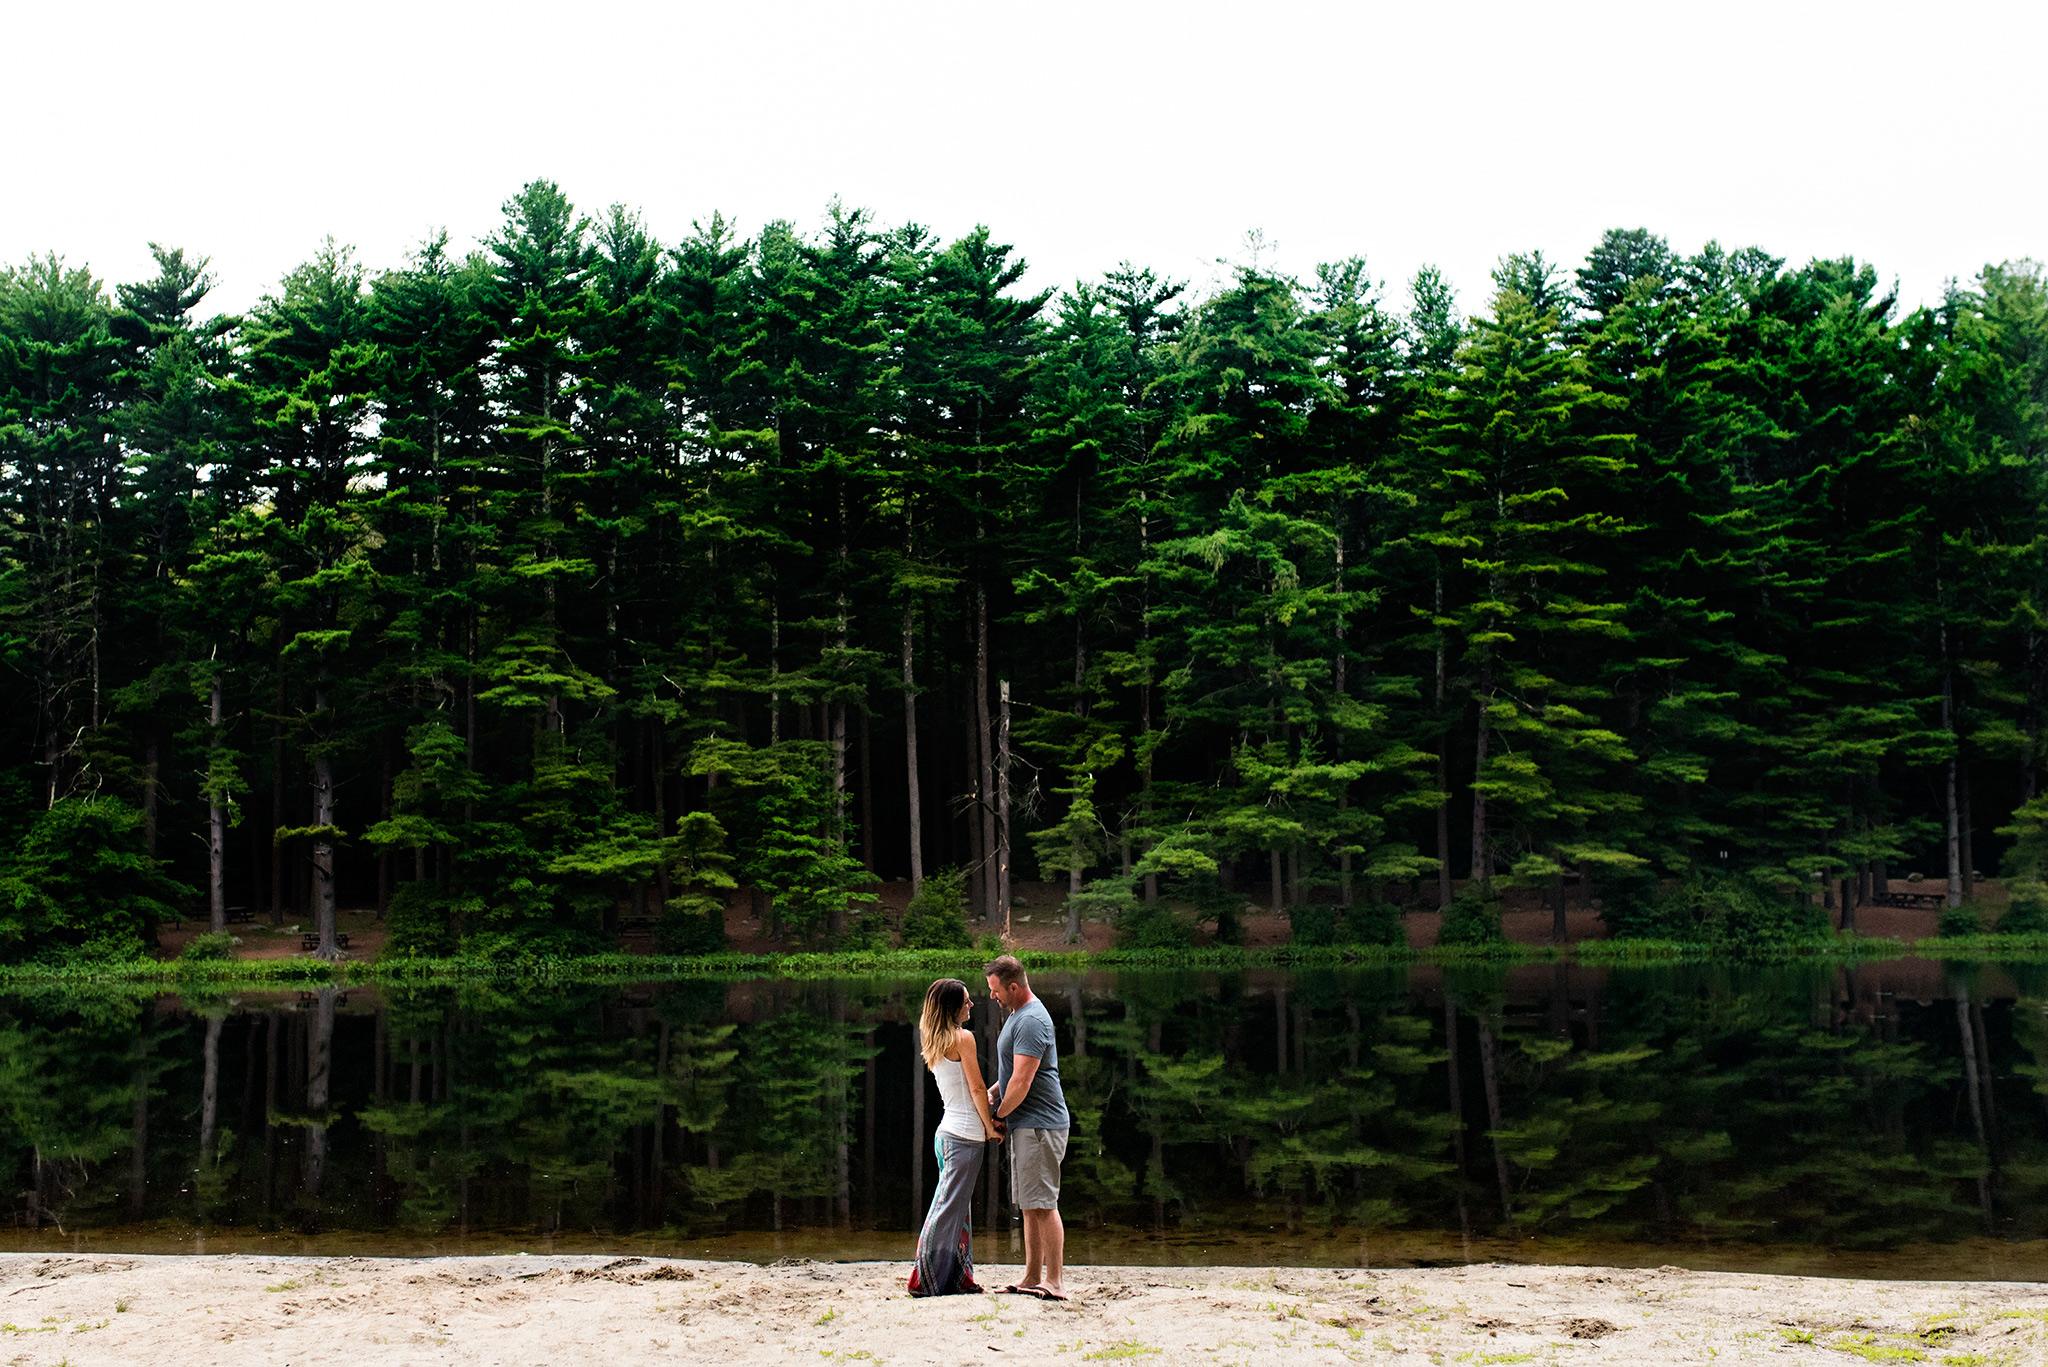 woodland elopement photography ct, wedding anniversary photographer ct